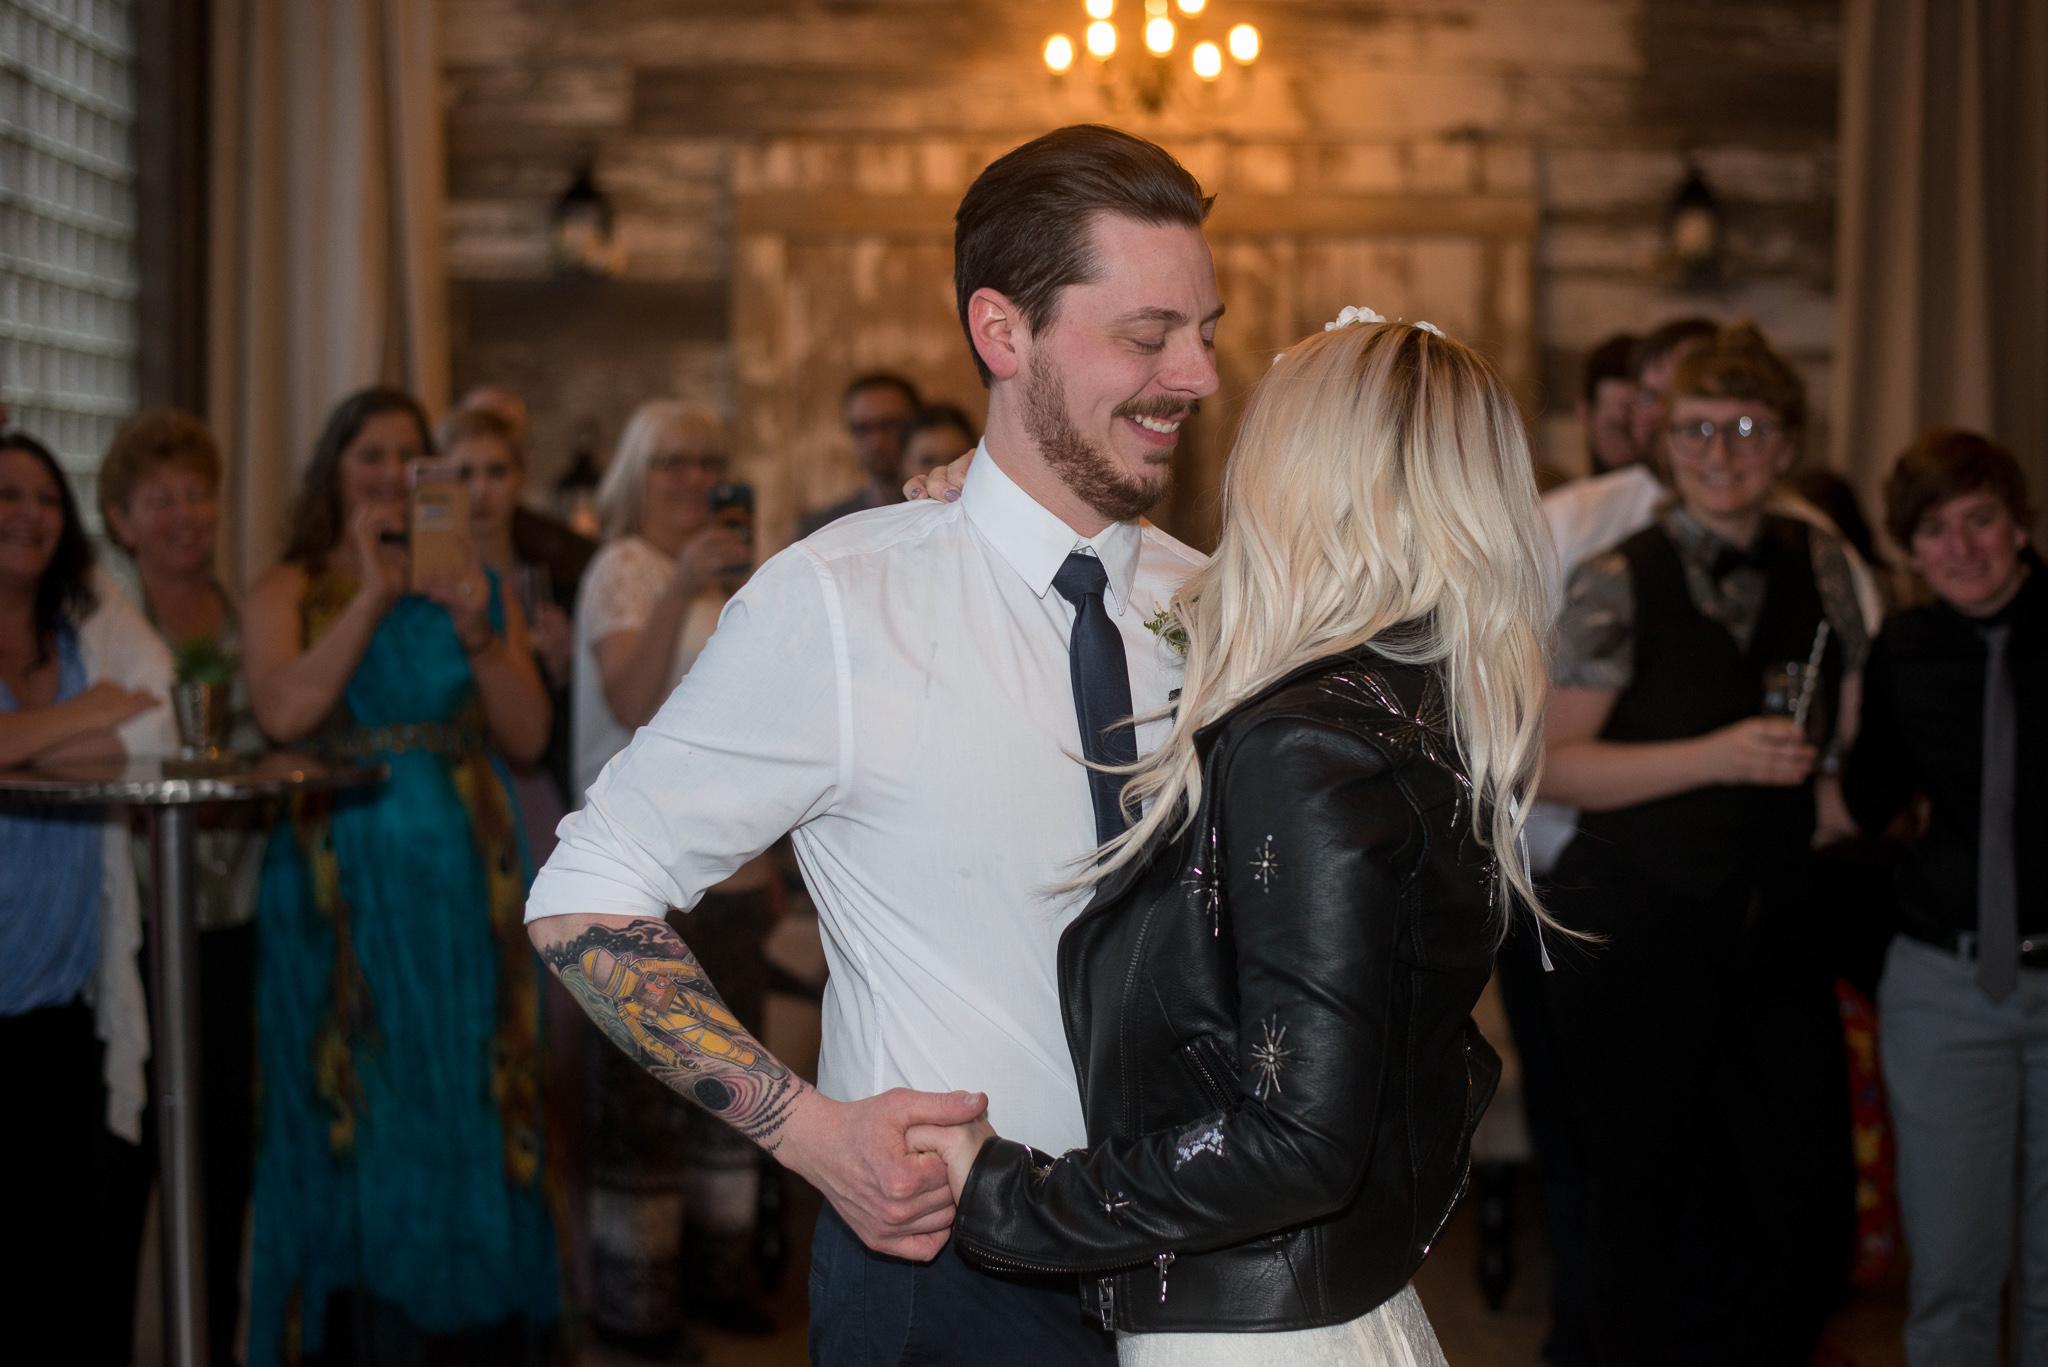 Wedding_Day_Moments_To_Do_List_Dalton&Lauren_404.jpg